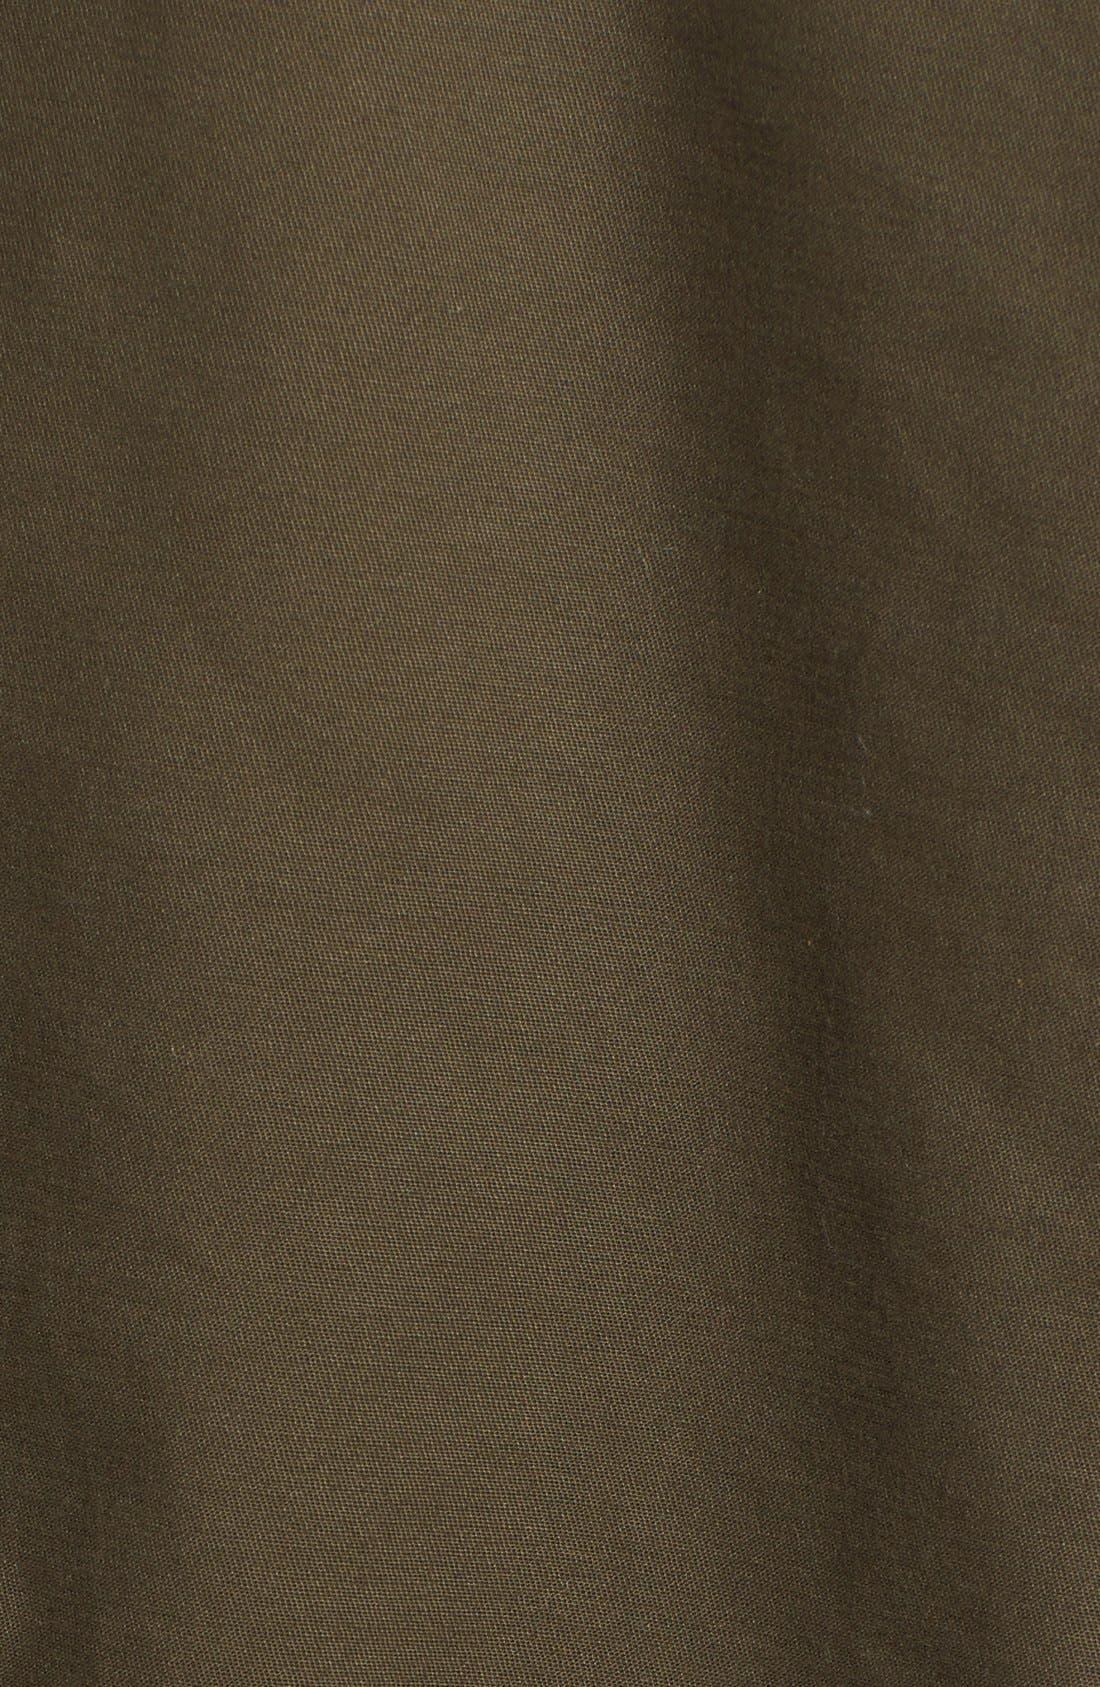 Alternate Image 5  - Tahari 'Jackie' Hooded Anorak with Removable Faux Fur Trim (Regular & Petite)